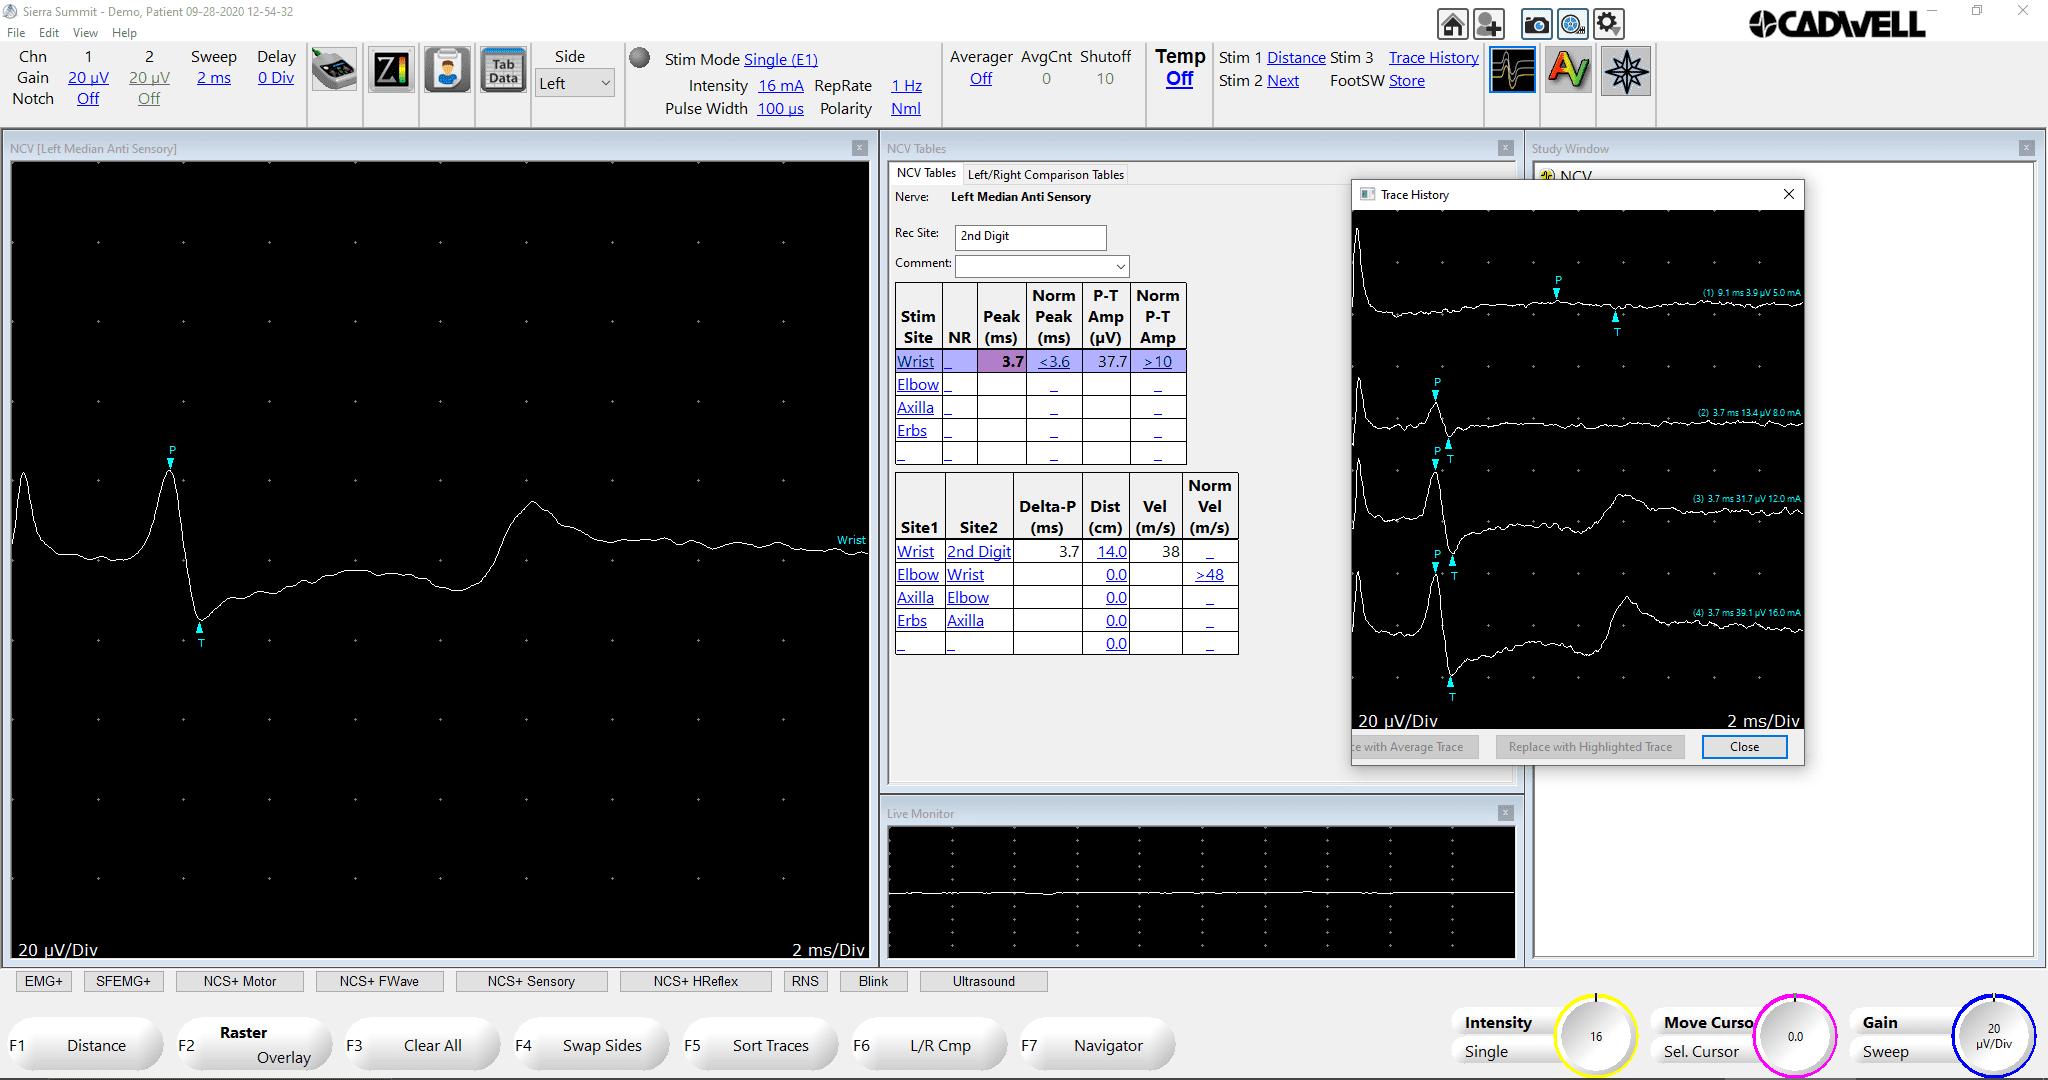 NCV Classic Sensory w trace history